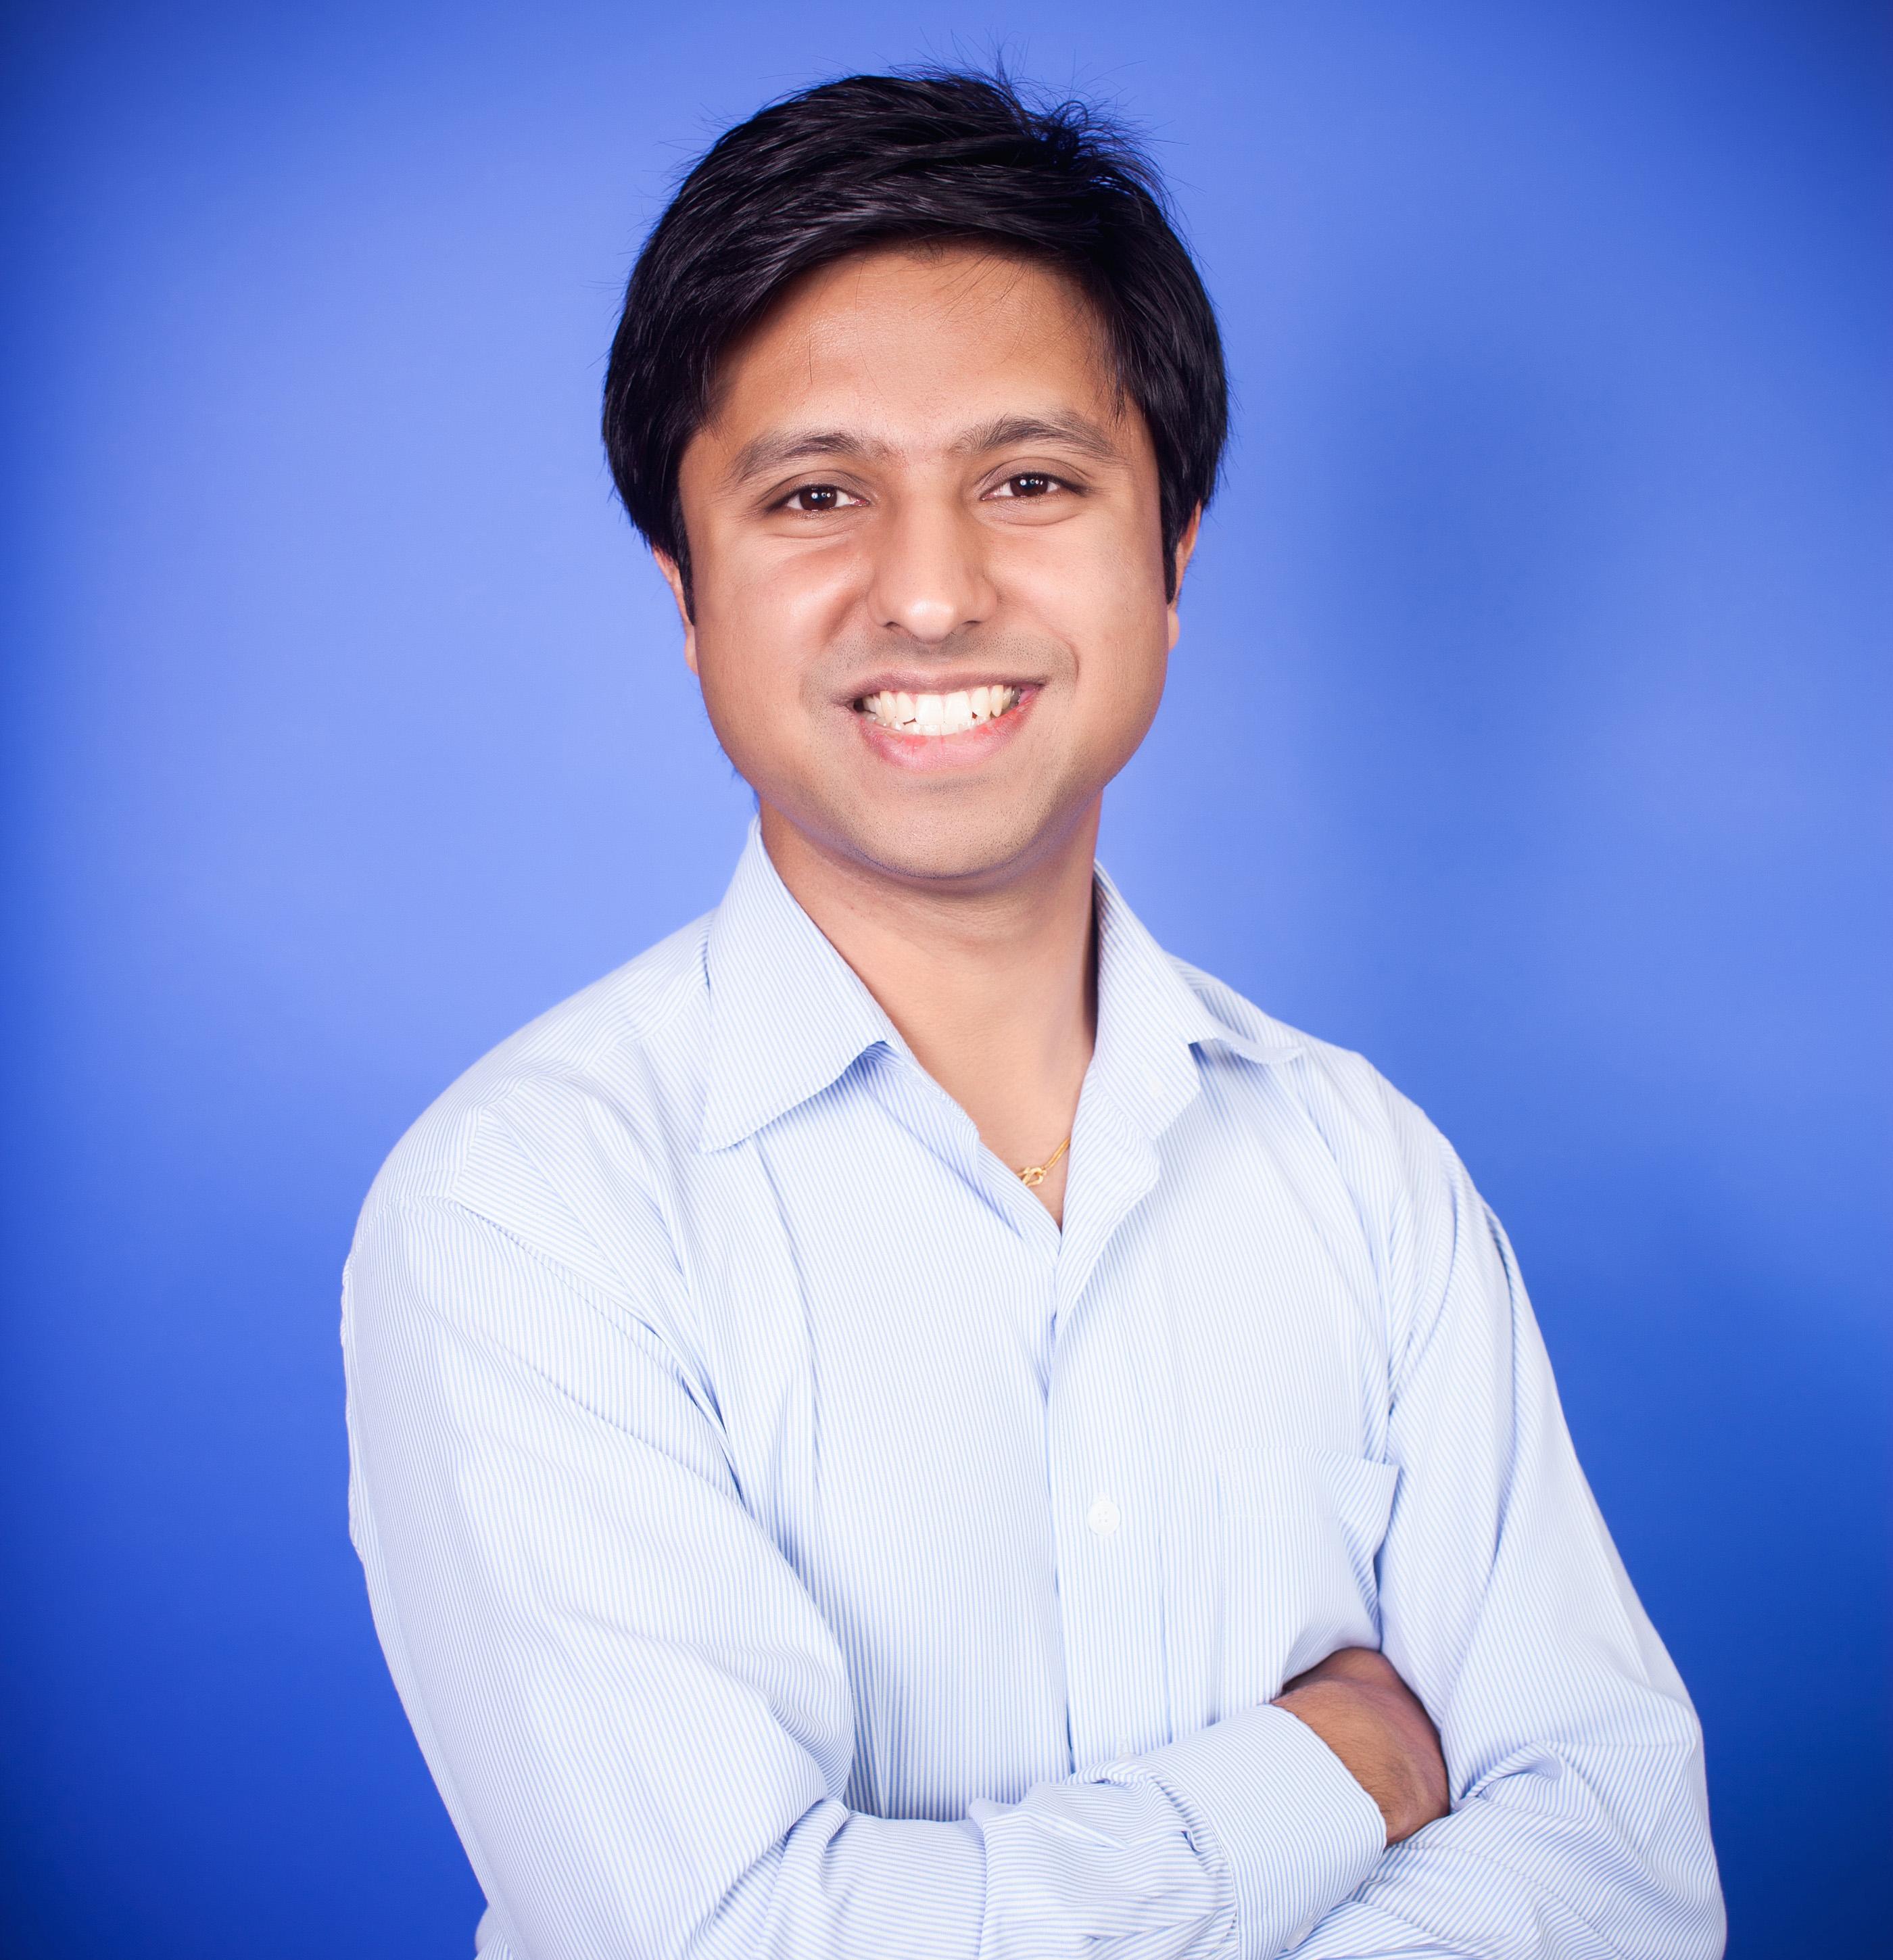 Akhilesh Gupta